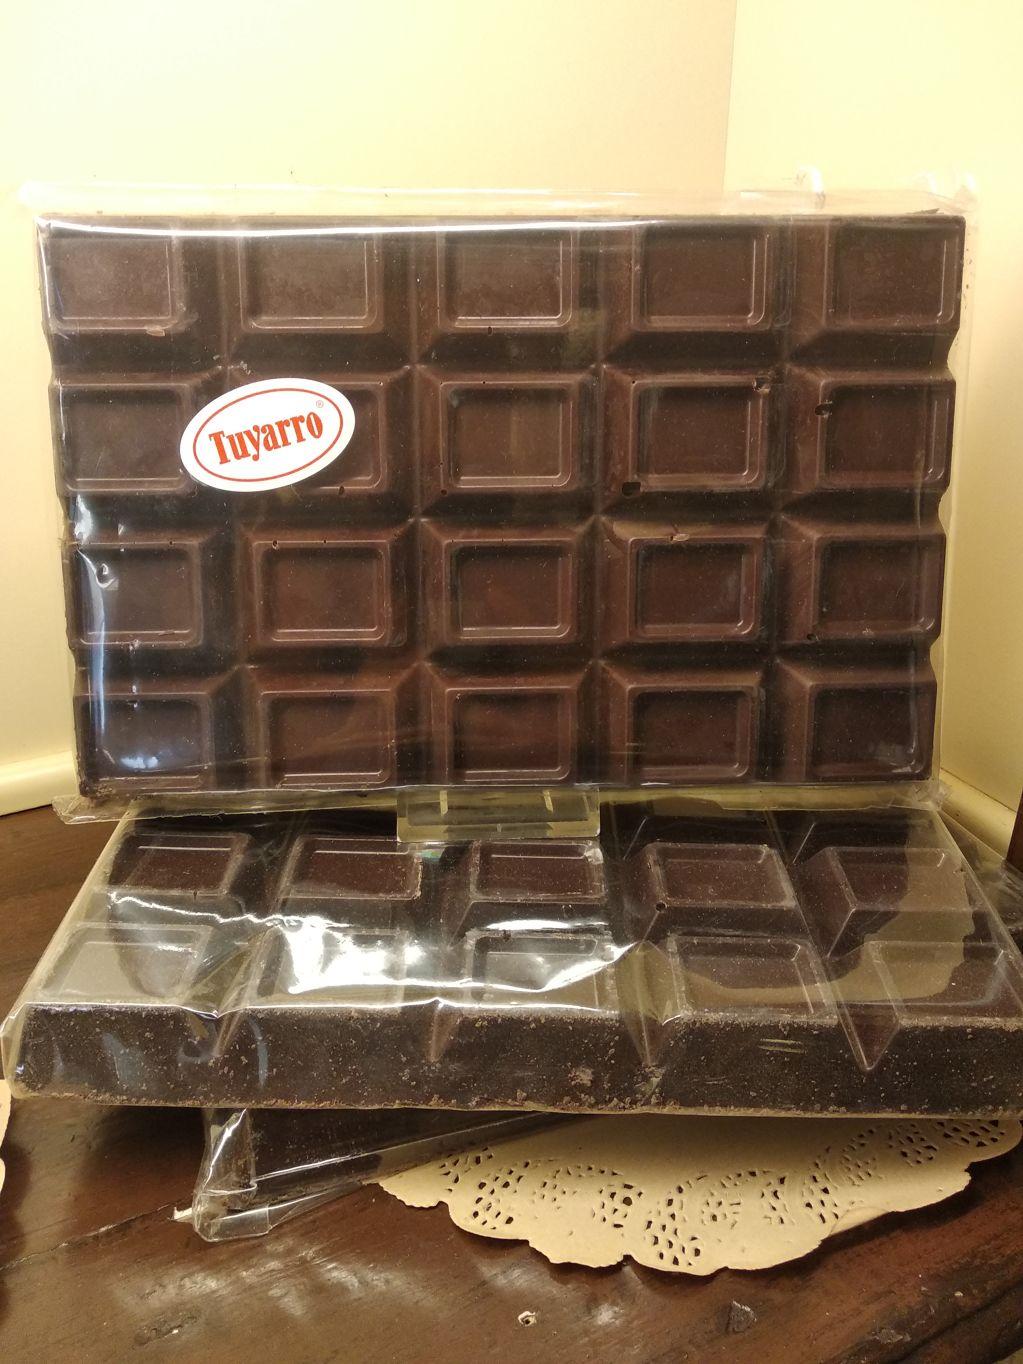 Xocolata cobertura 1000 gr. - 47f24-IMG_20200901_100328_i438.jpg